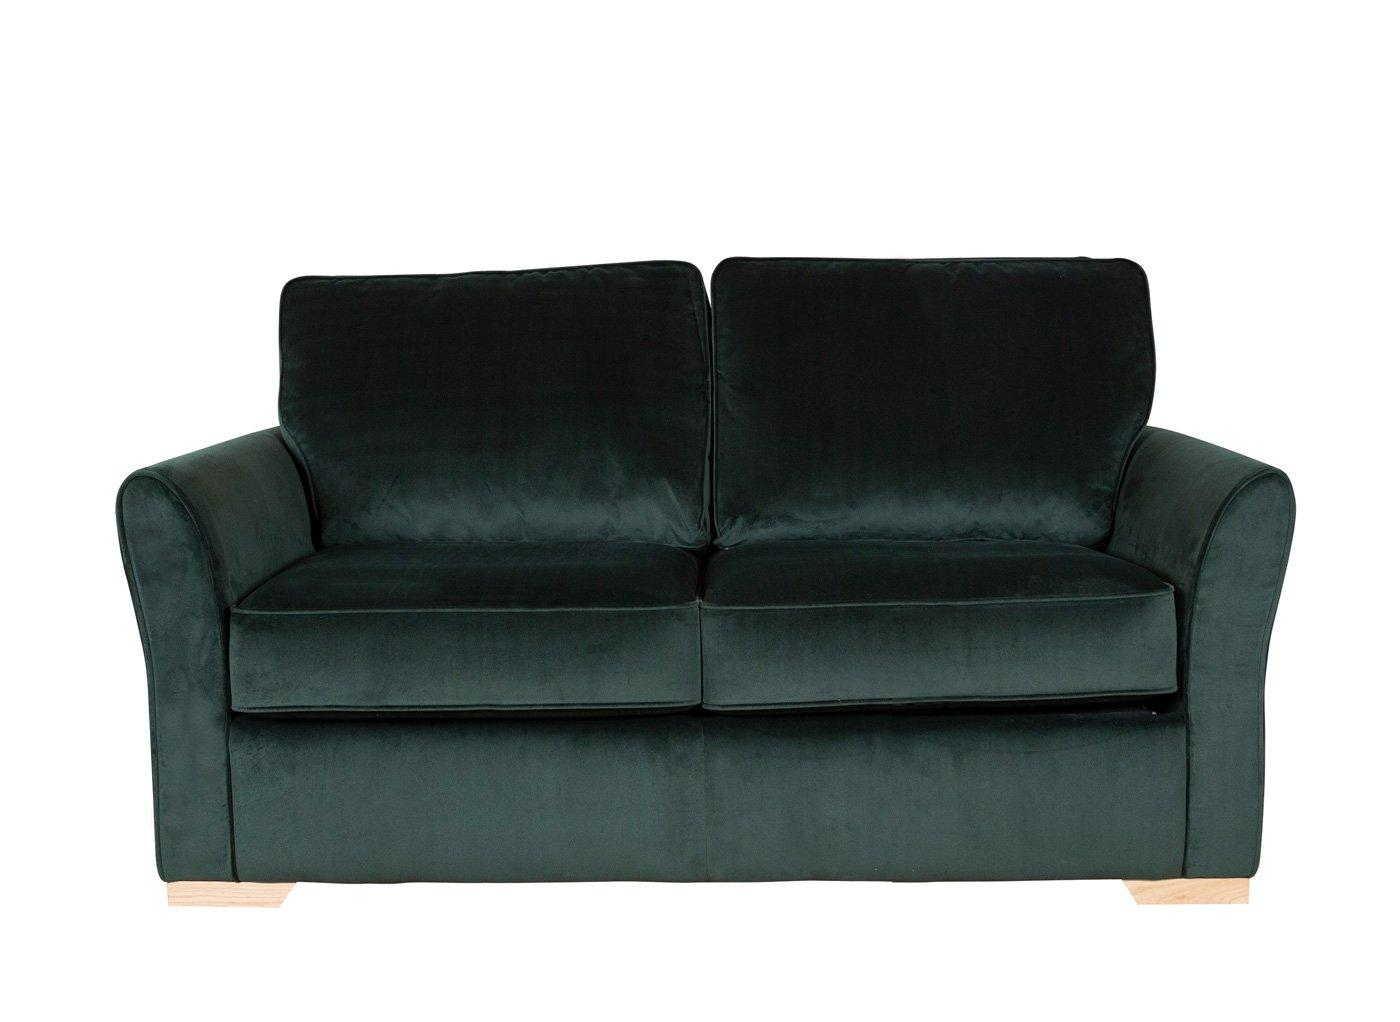 Willis Sofa Bed Double GREEN